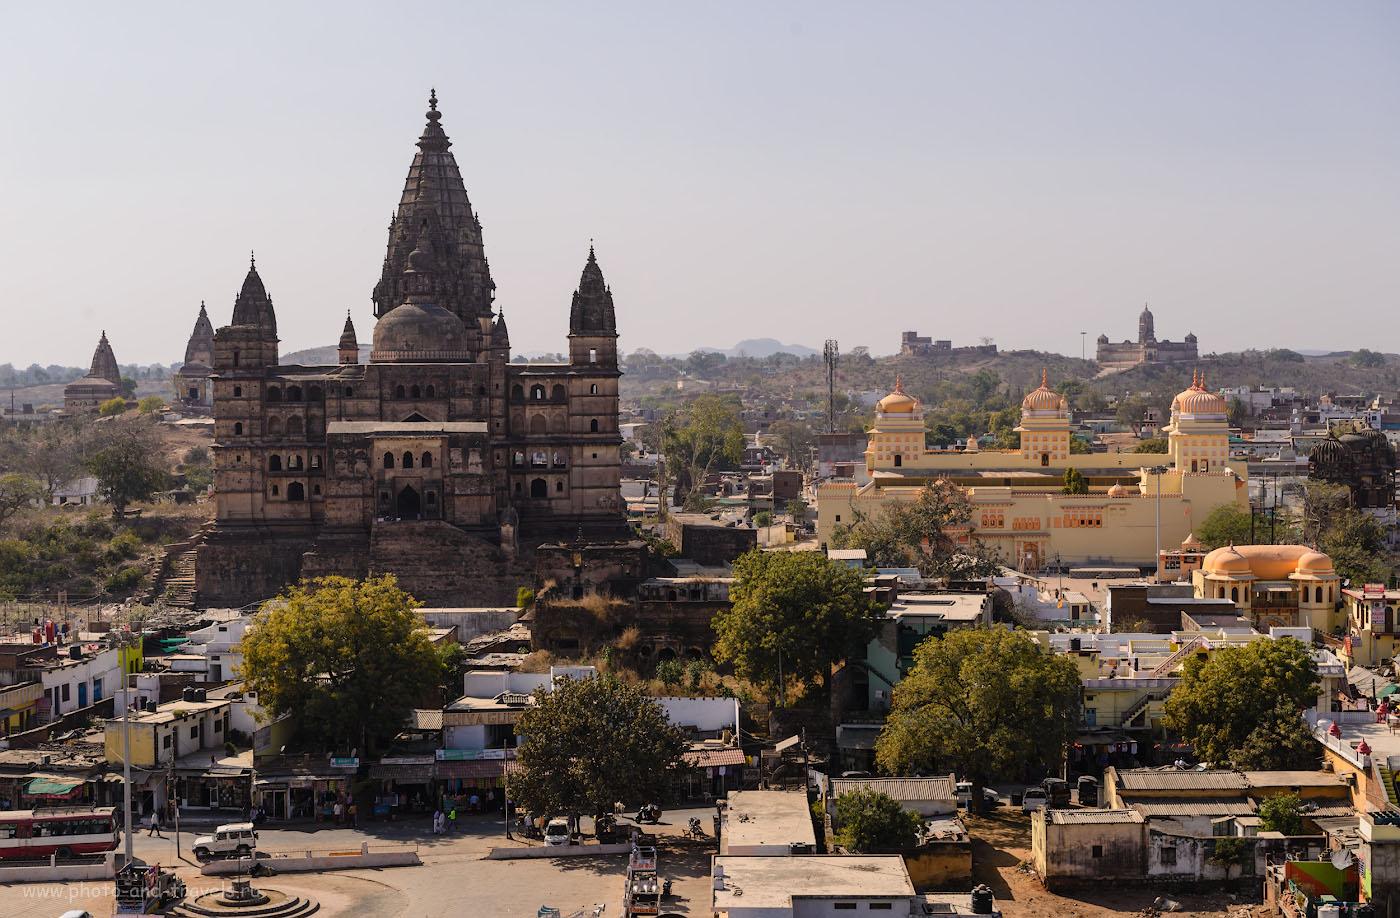 Фотография 12. Вид на храм Чатурбхудж Мандир со стен дворца Джахангир-Махал. Желтый храм - Ram Raja Temple. Вдали видна третья старинная достопримечательность Орчхи – Лакшми-Нараян (LakshmiNarayan Temple). 1/250, -0.33, 100, 58.